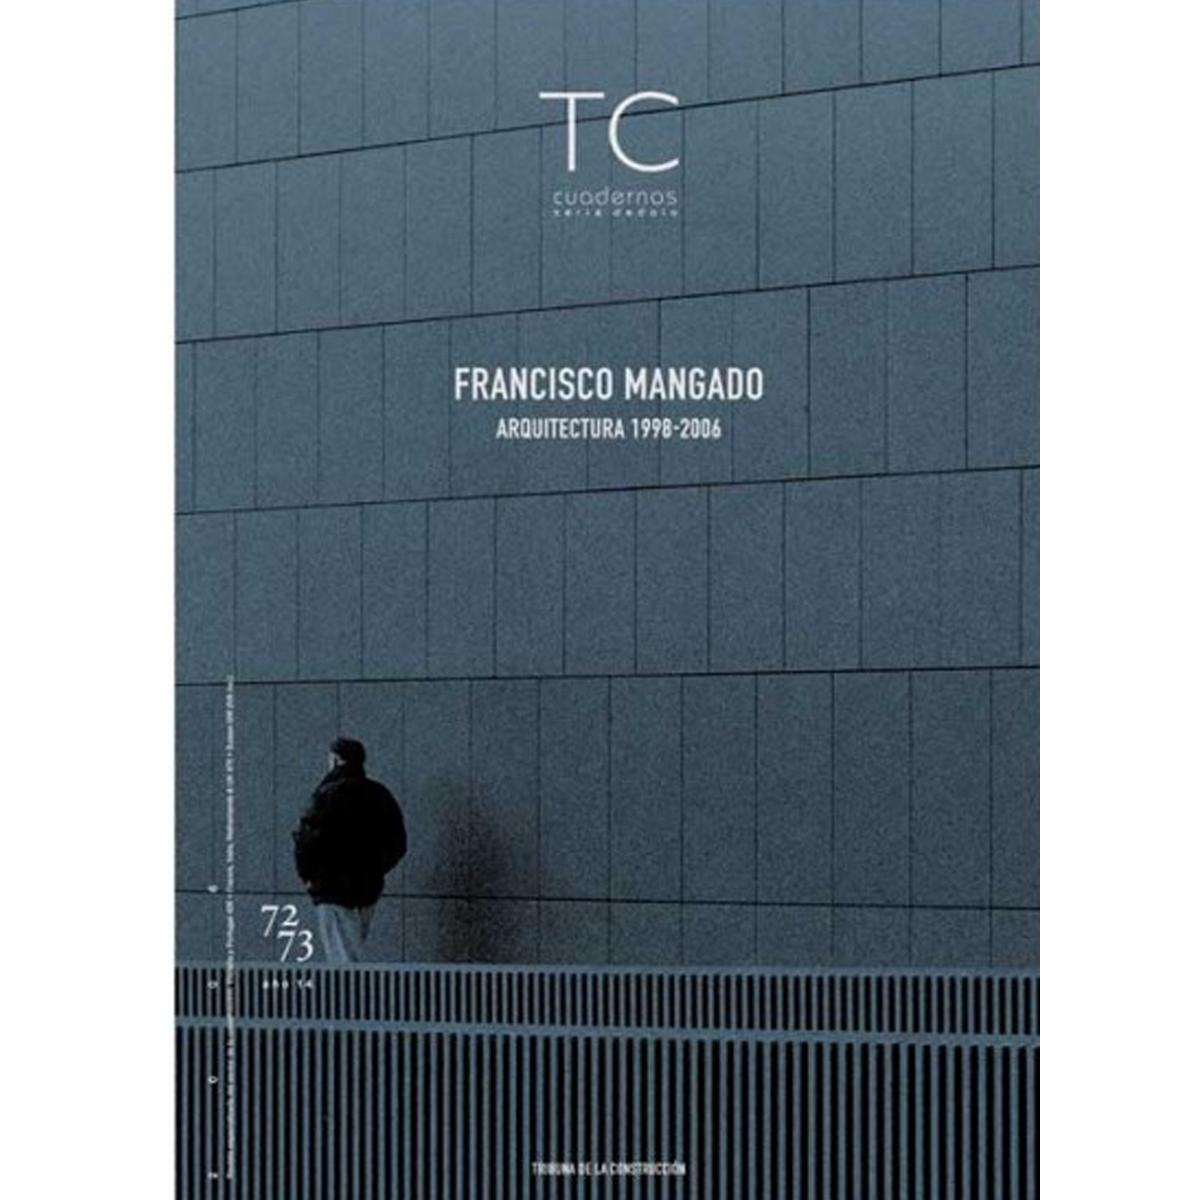 TC Cuadernos: Francisco Mangado